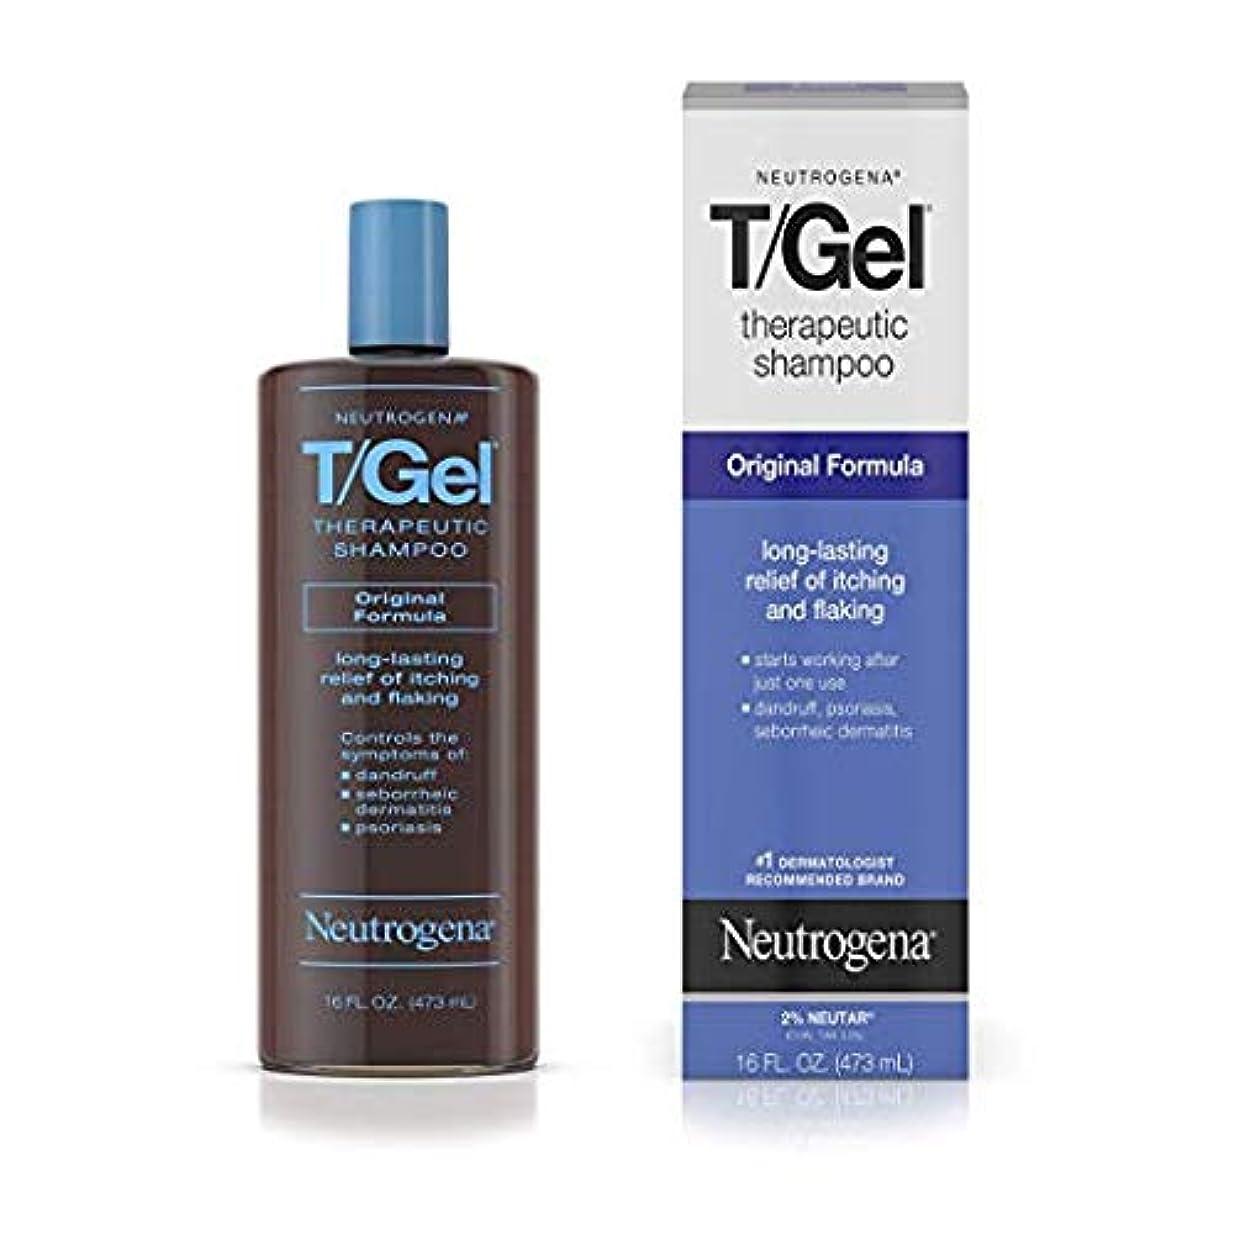 Neutrogena T/Gel Therapeutic Shampoo Original Formula [並行輸入品]